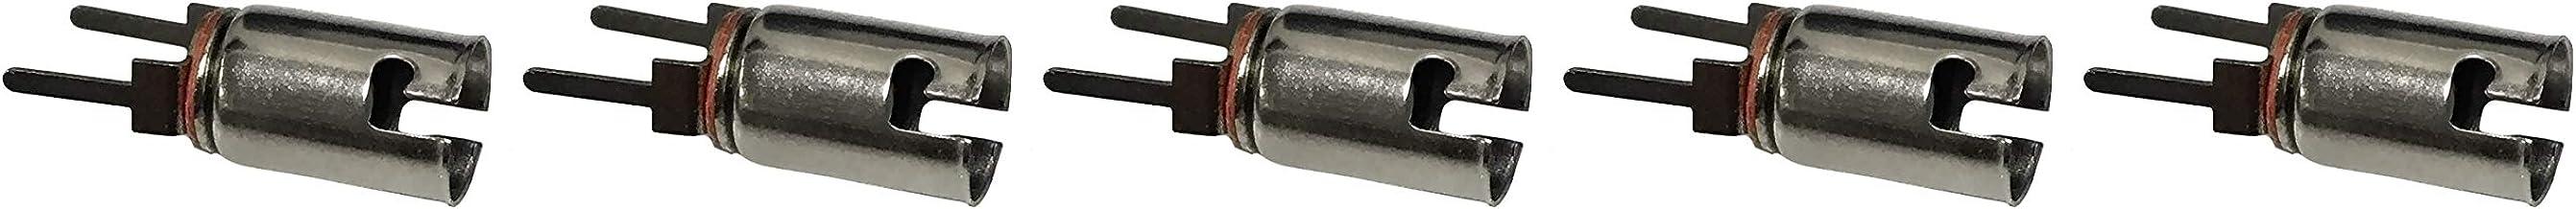 Insulated Mounting Bracket Pack of 5 BA9s Bayonet Lamp Holder Bulb Socket